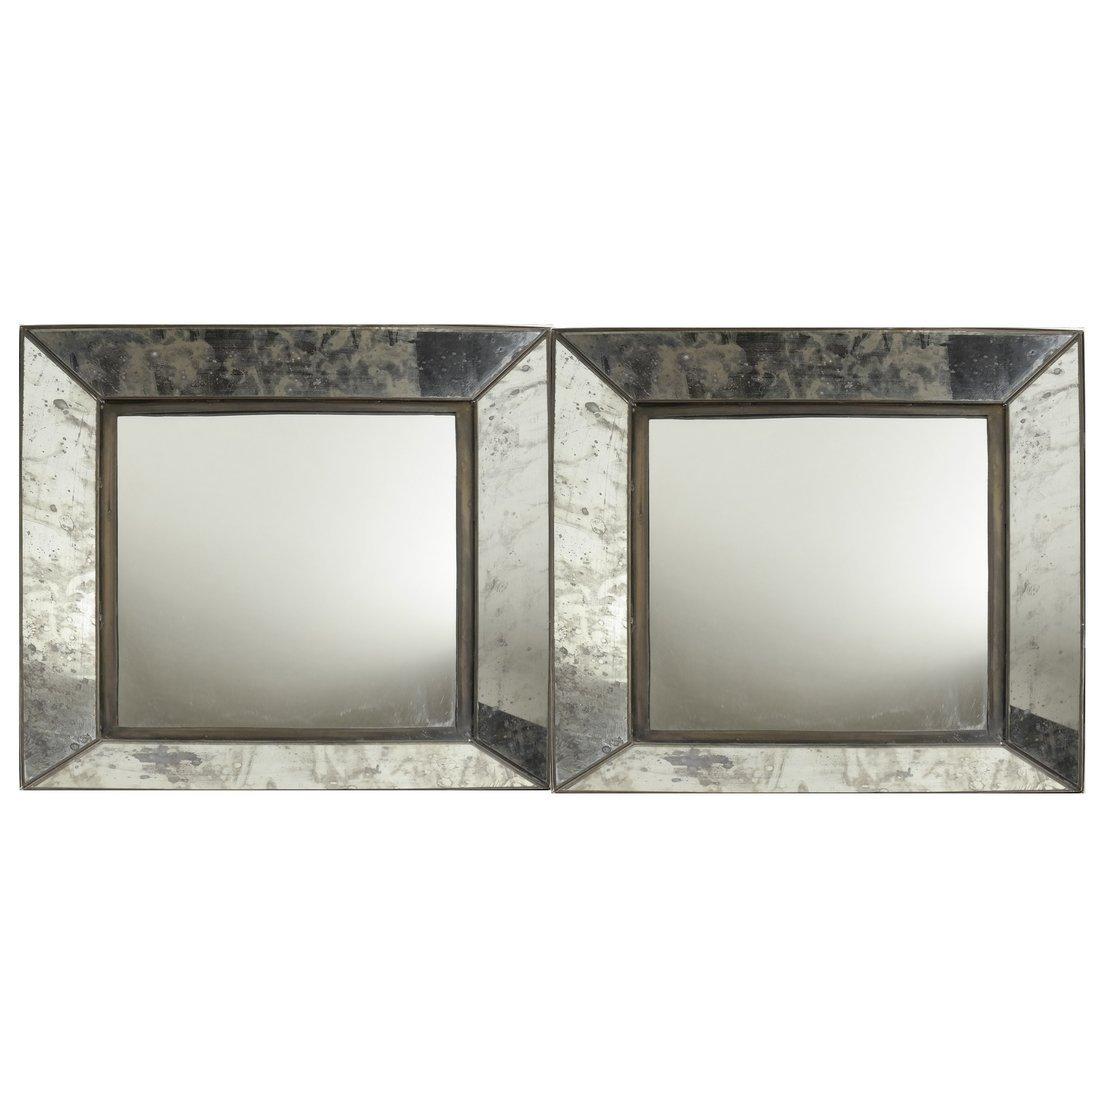 Pair of Metal Framed Mirrors